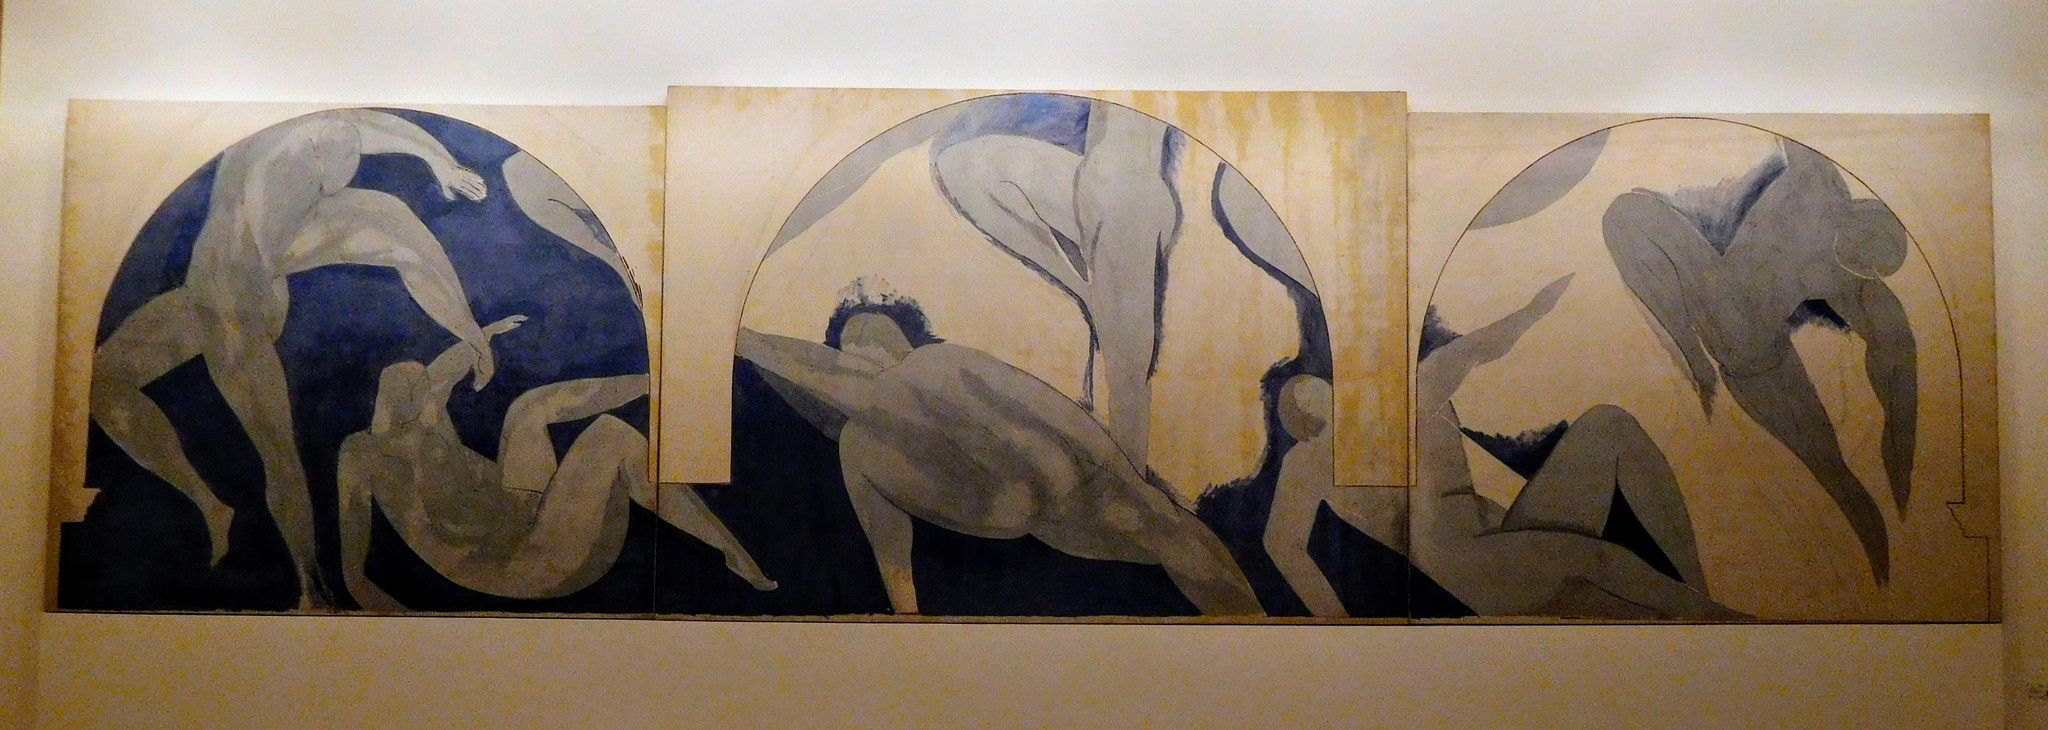 "Matisse's ""La Danse Inachevee"" (1931) at the Musee d'Art Moderne."